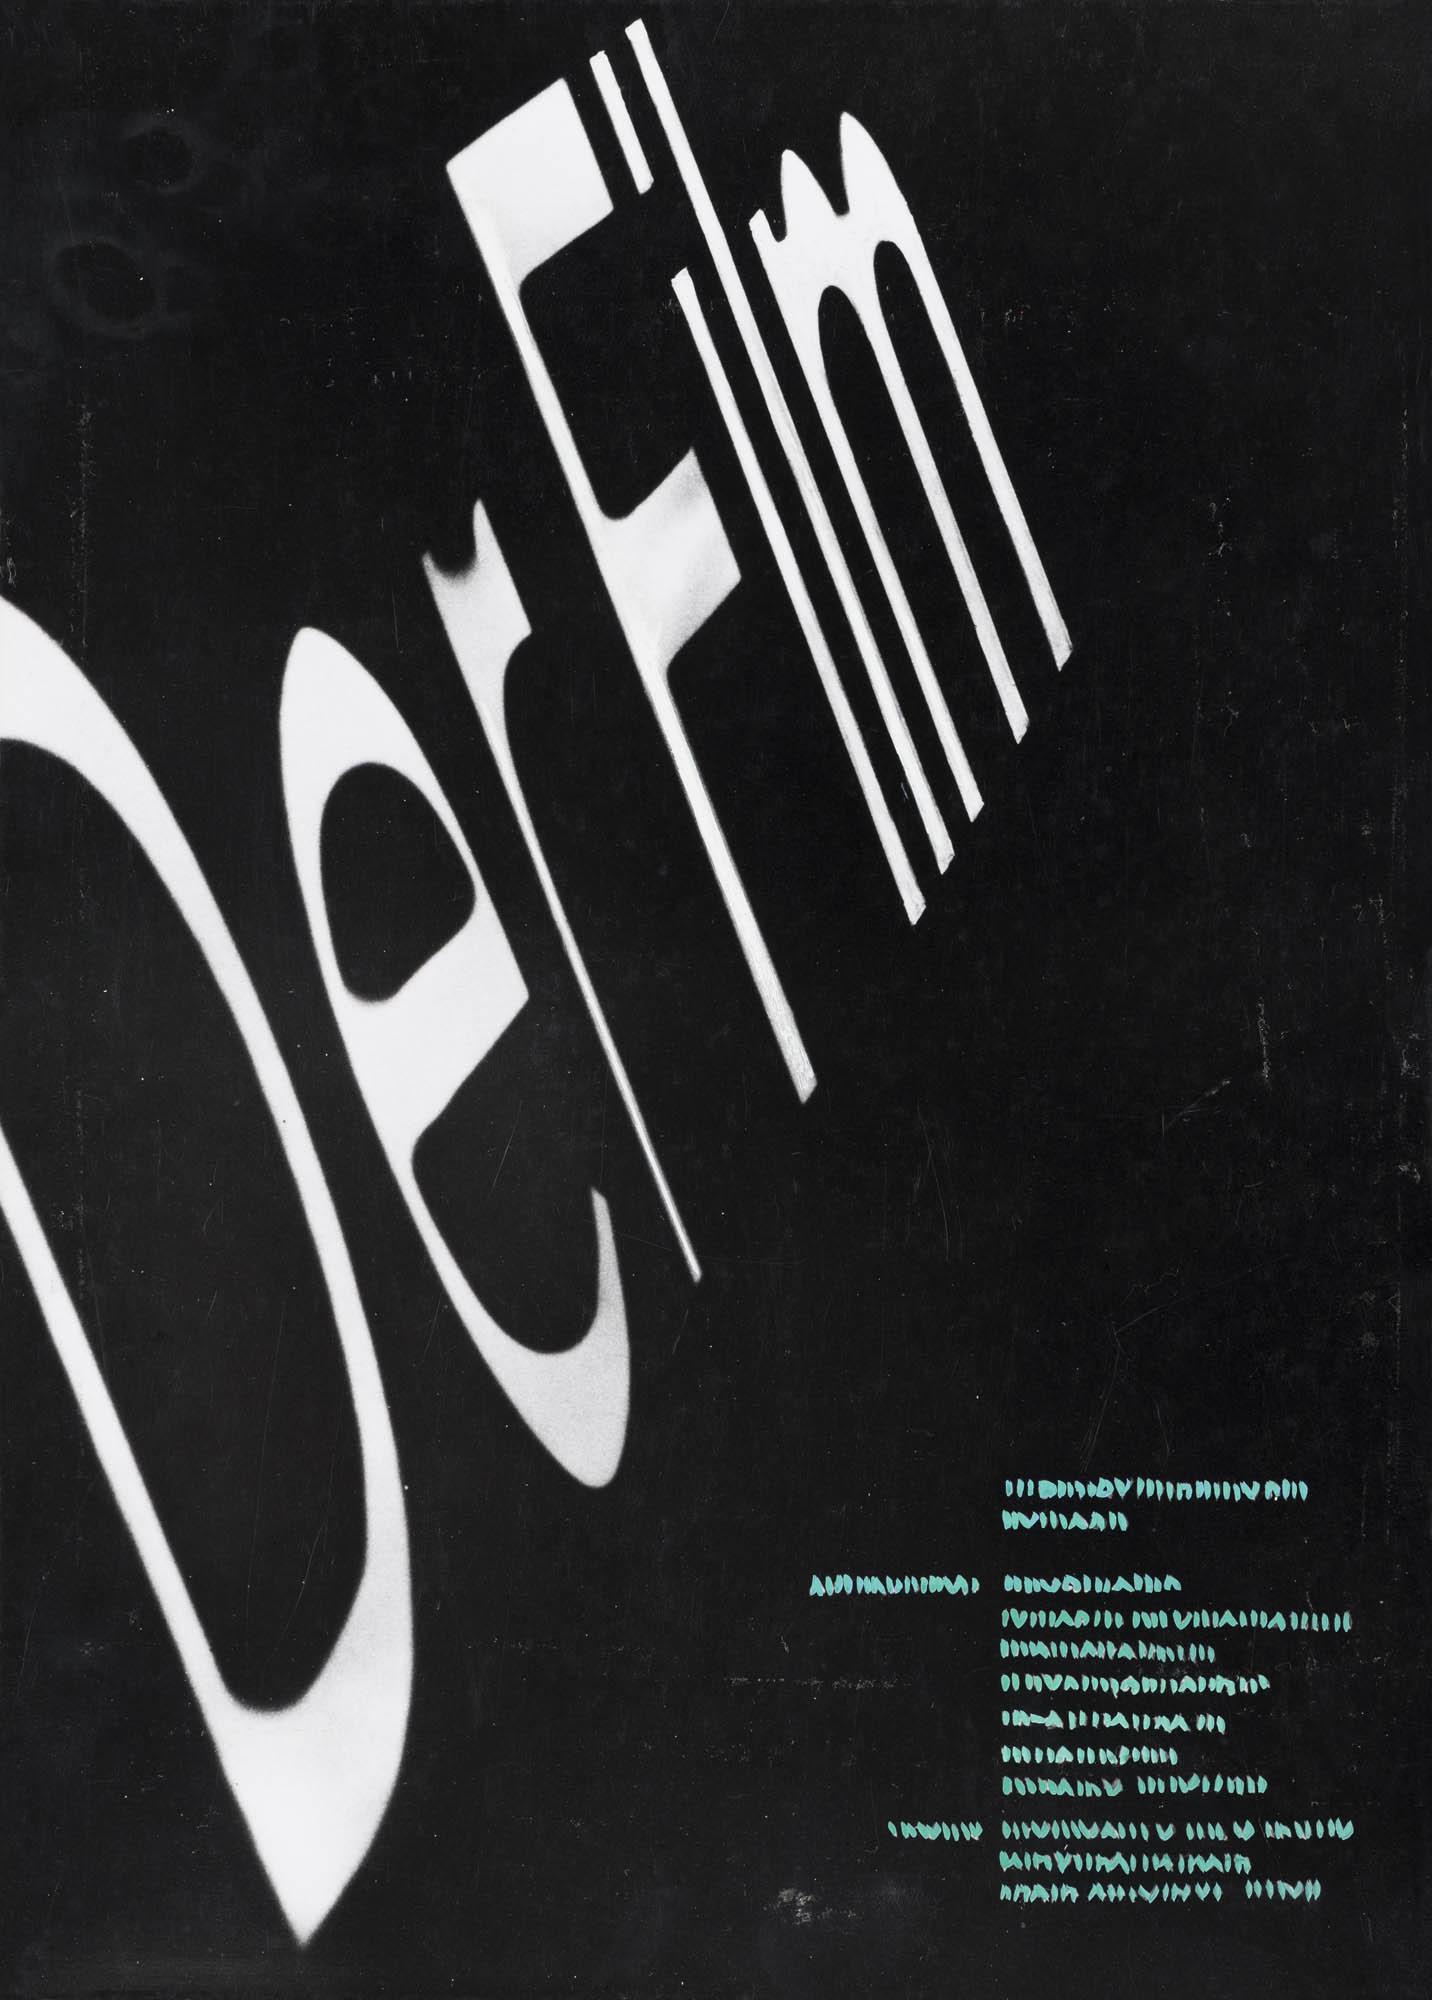 Kunstgewerbemuseum Zürich – Der Film Josef Müller-Brockmann Plakat